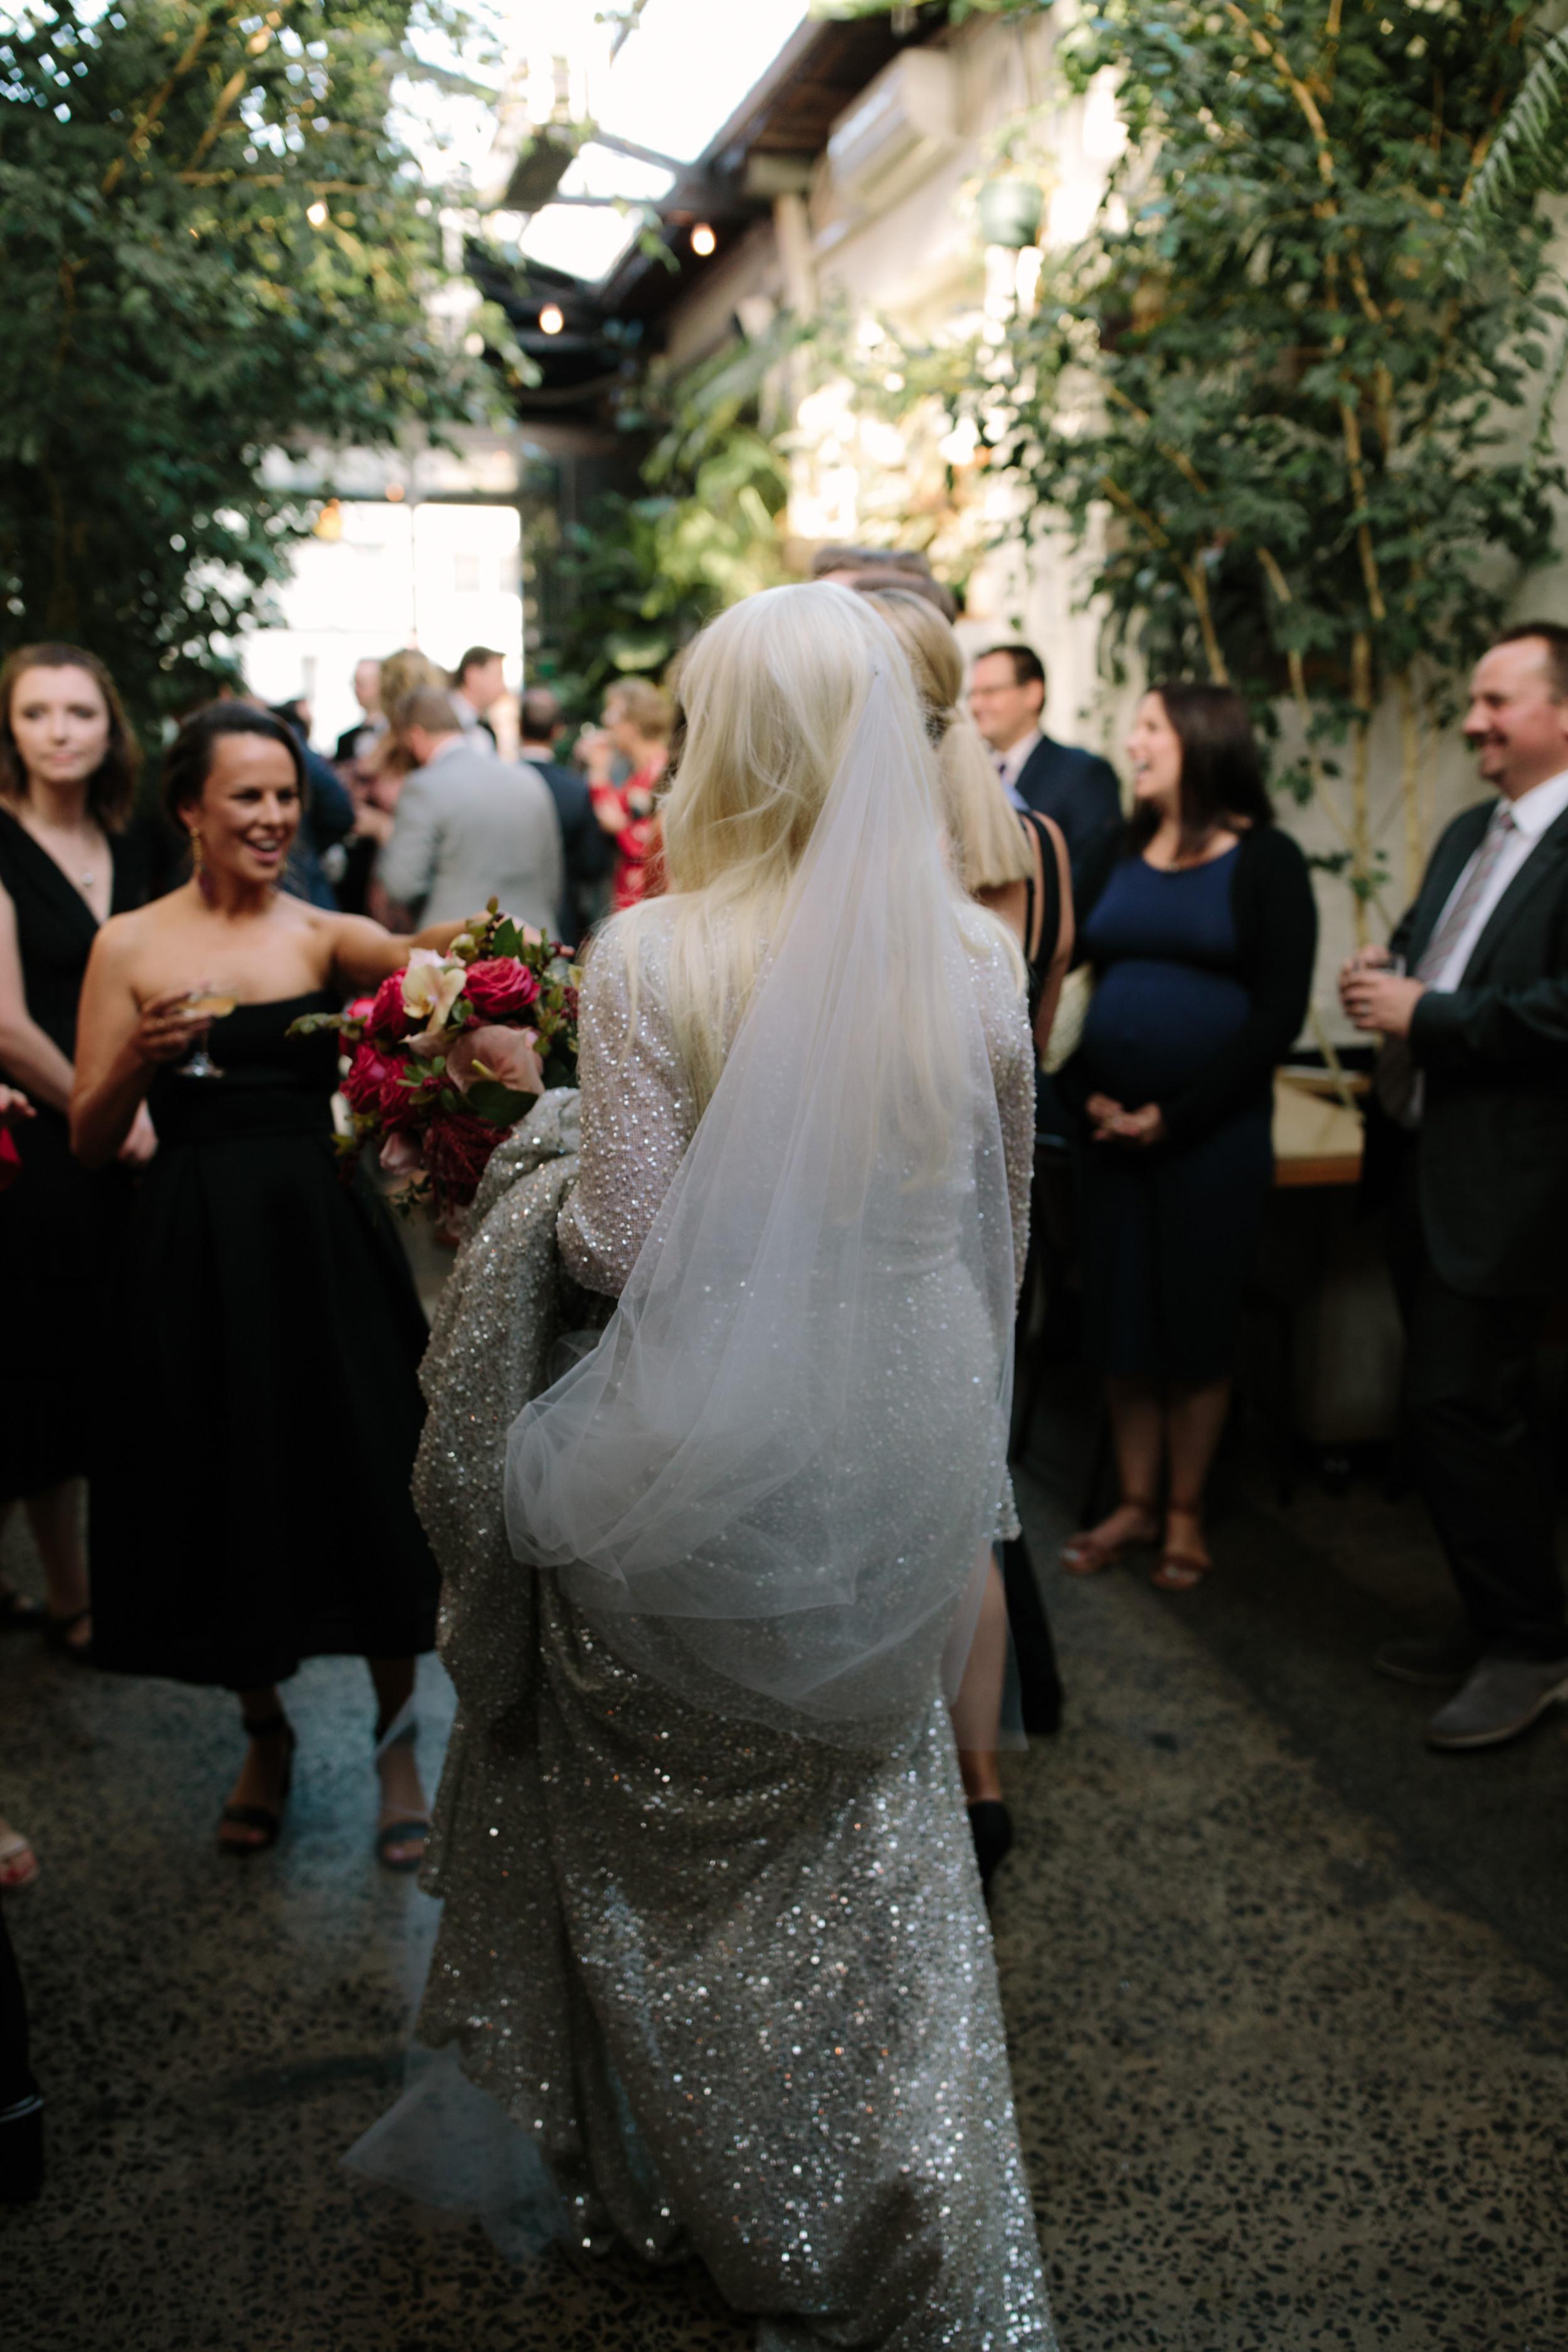 I-Got-You-Babe-Weddings-Tori-Will-Rupert0066.JPG